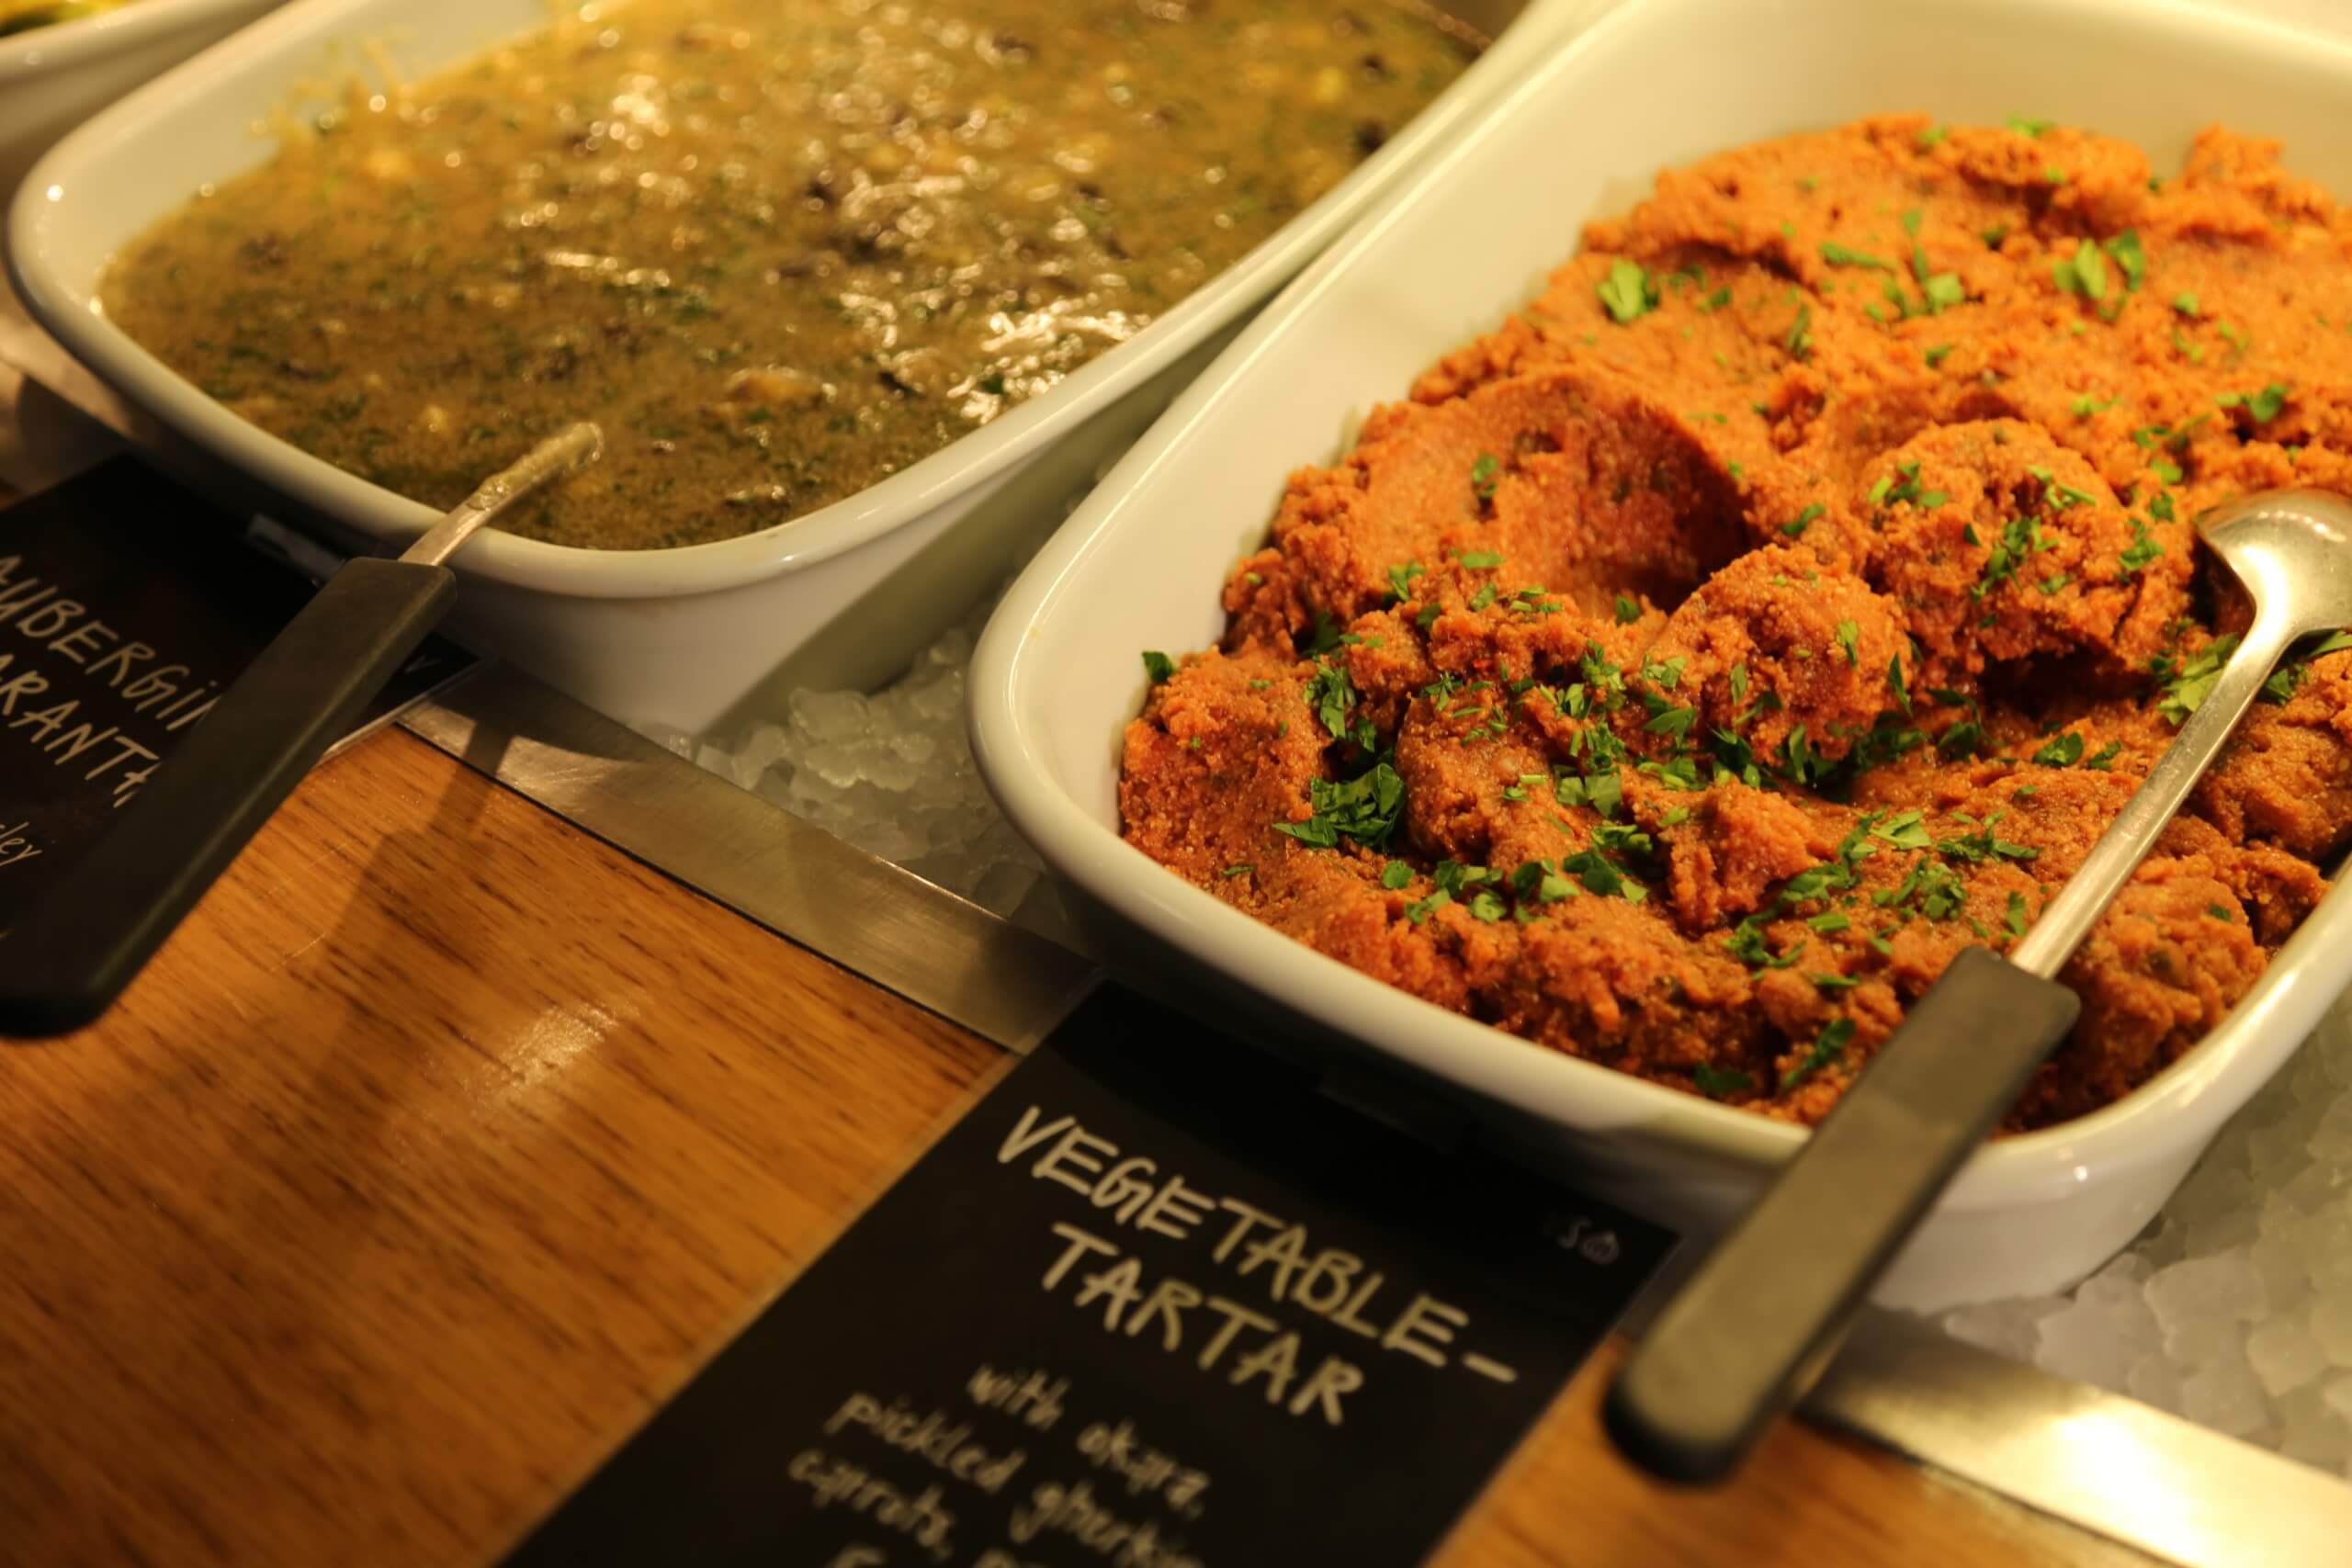 Tibits Heddon Street Review, Tibits Heddon Street, Tibits Review, tibits food